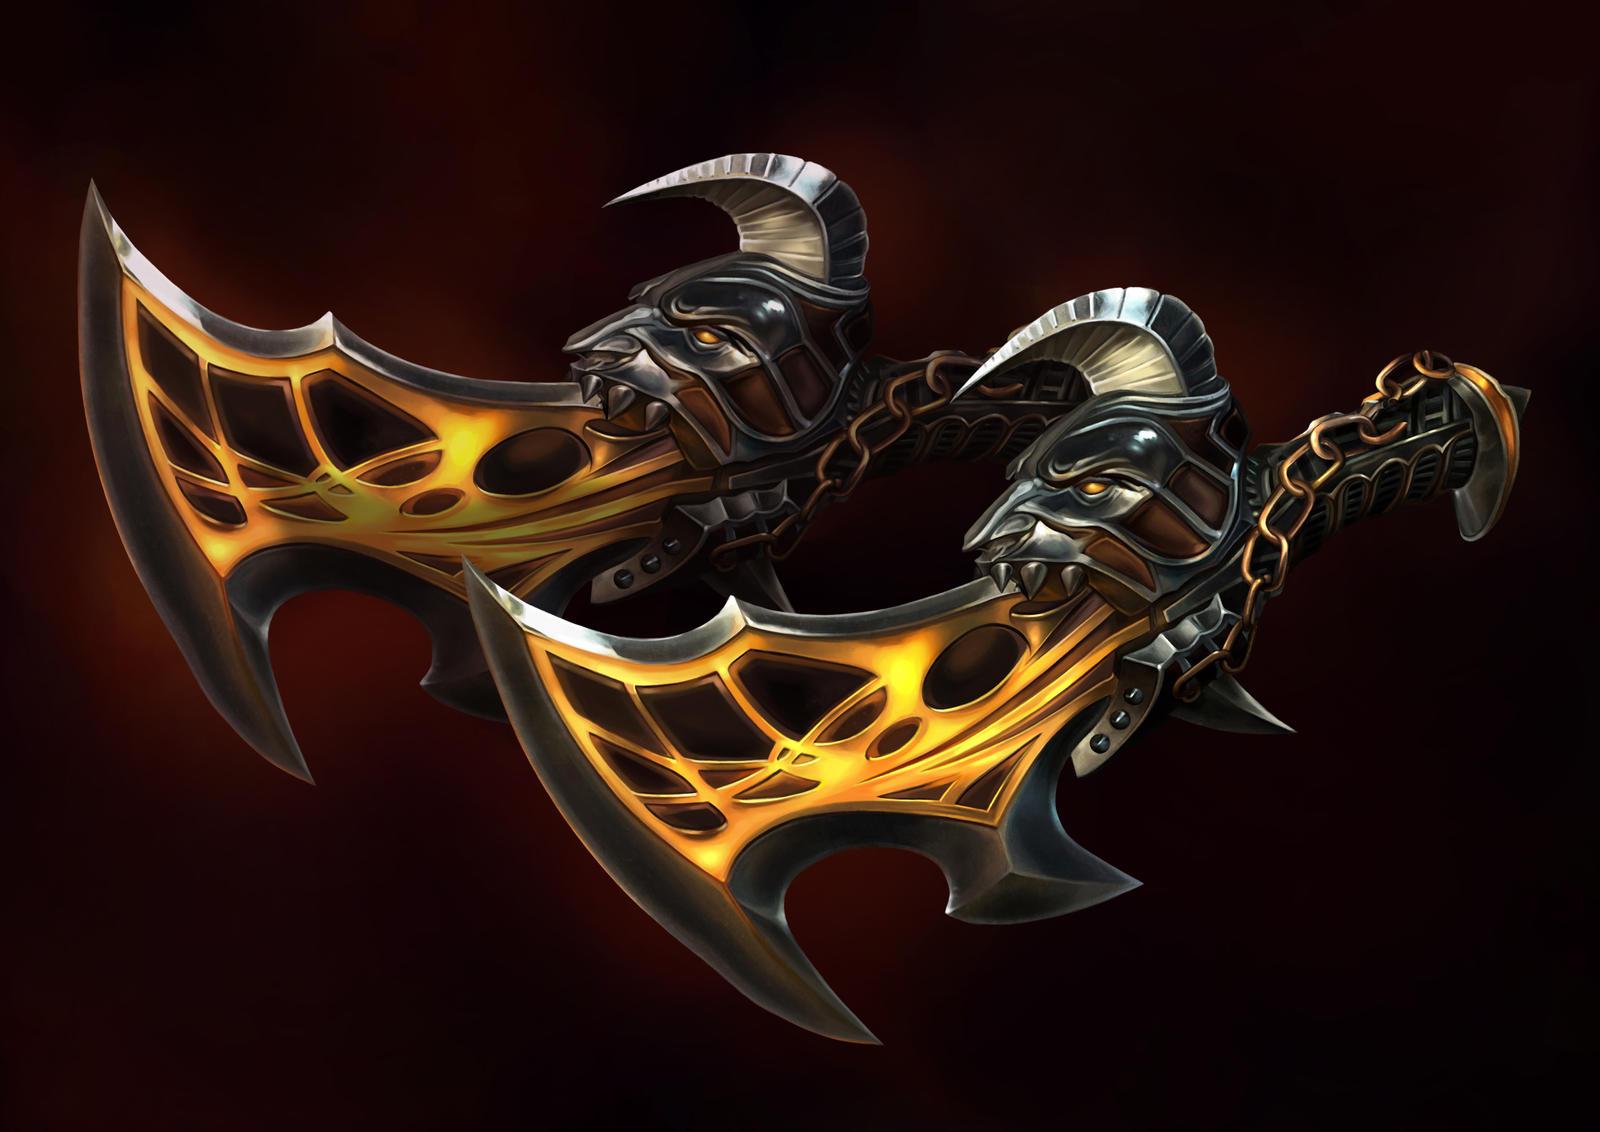 God Of War 3 Blades Of Exile Blades of Exile Practice